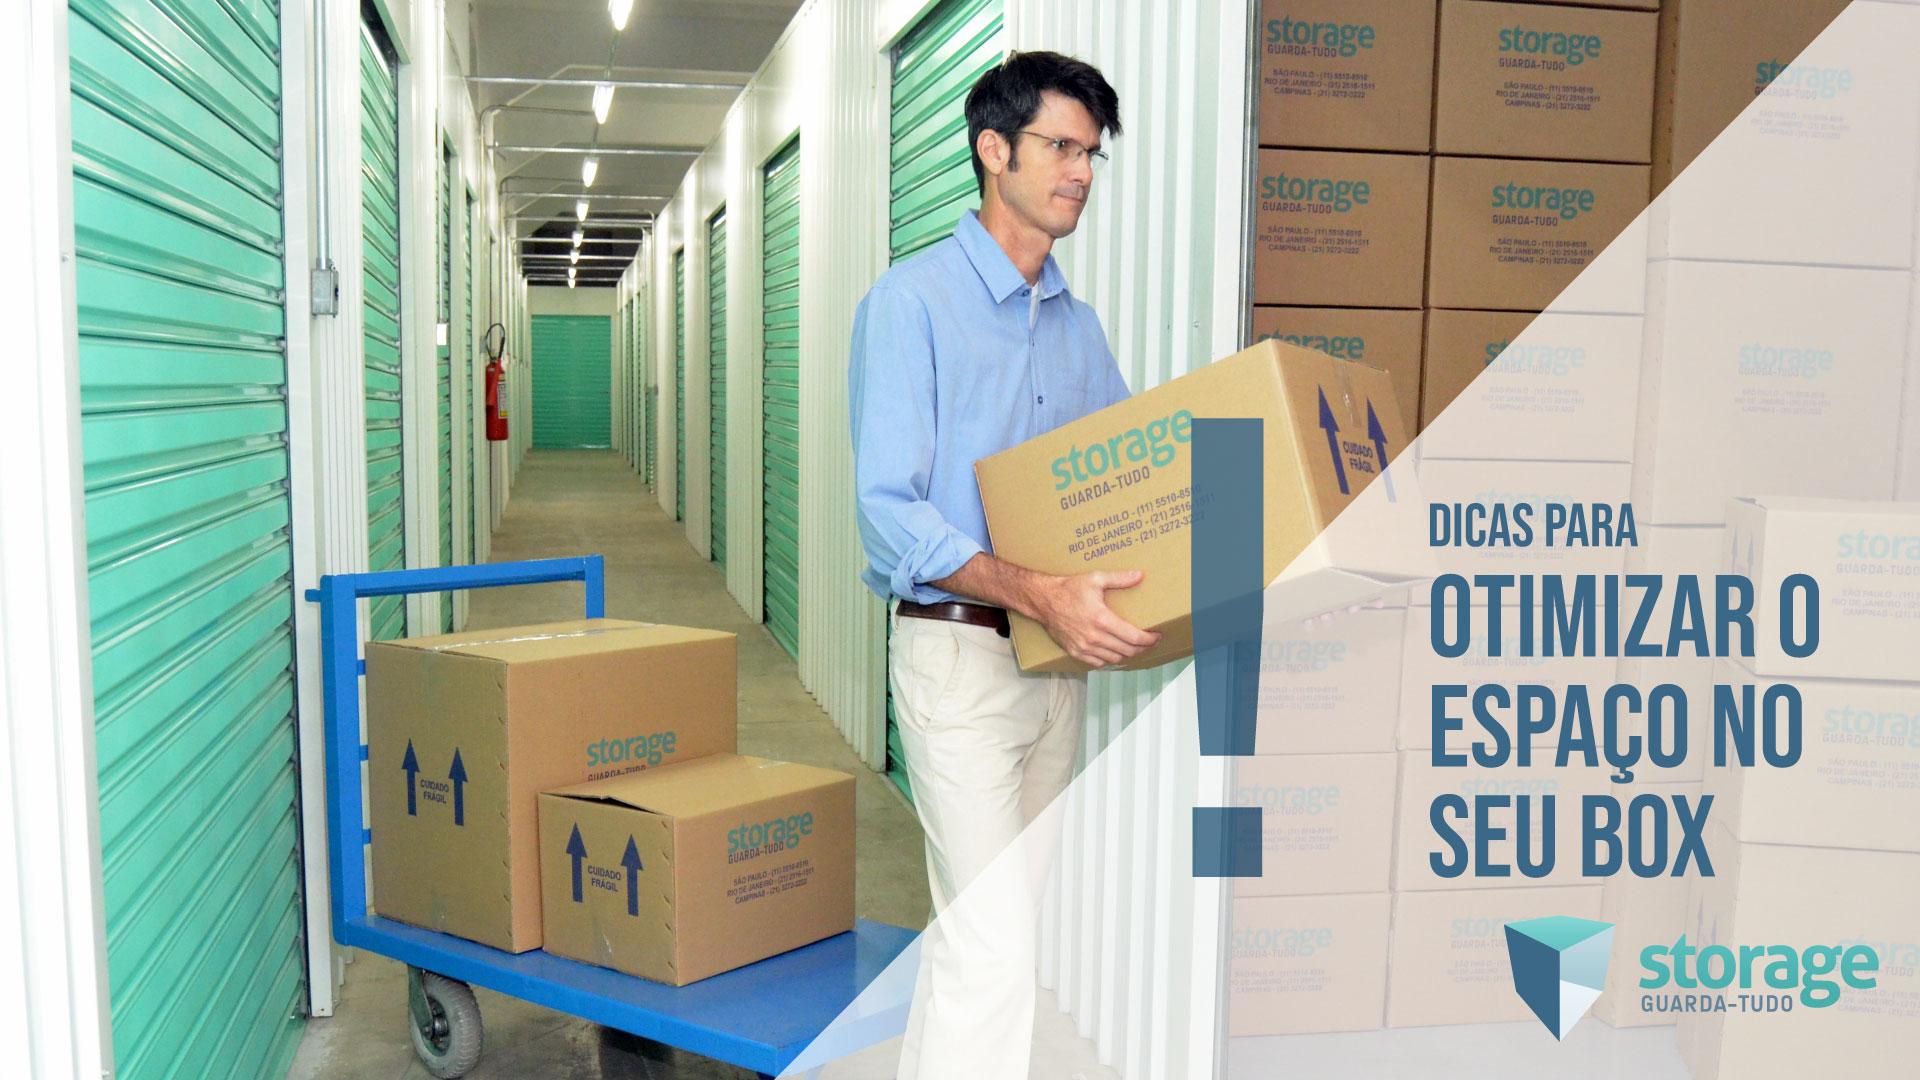 self-atorage-otimizar-espaco-box